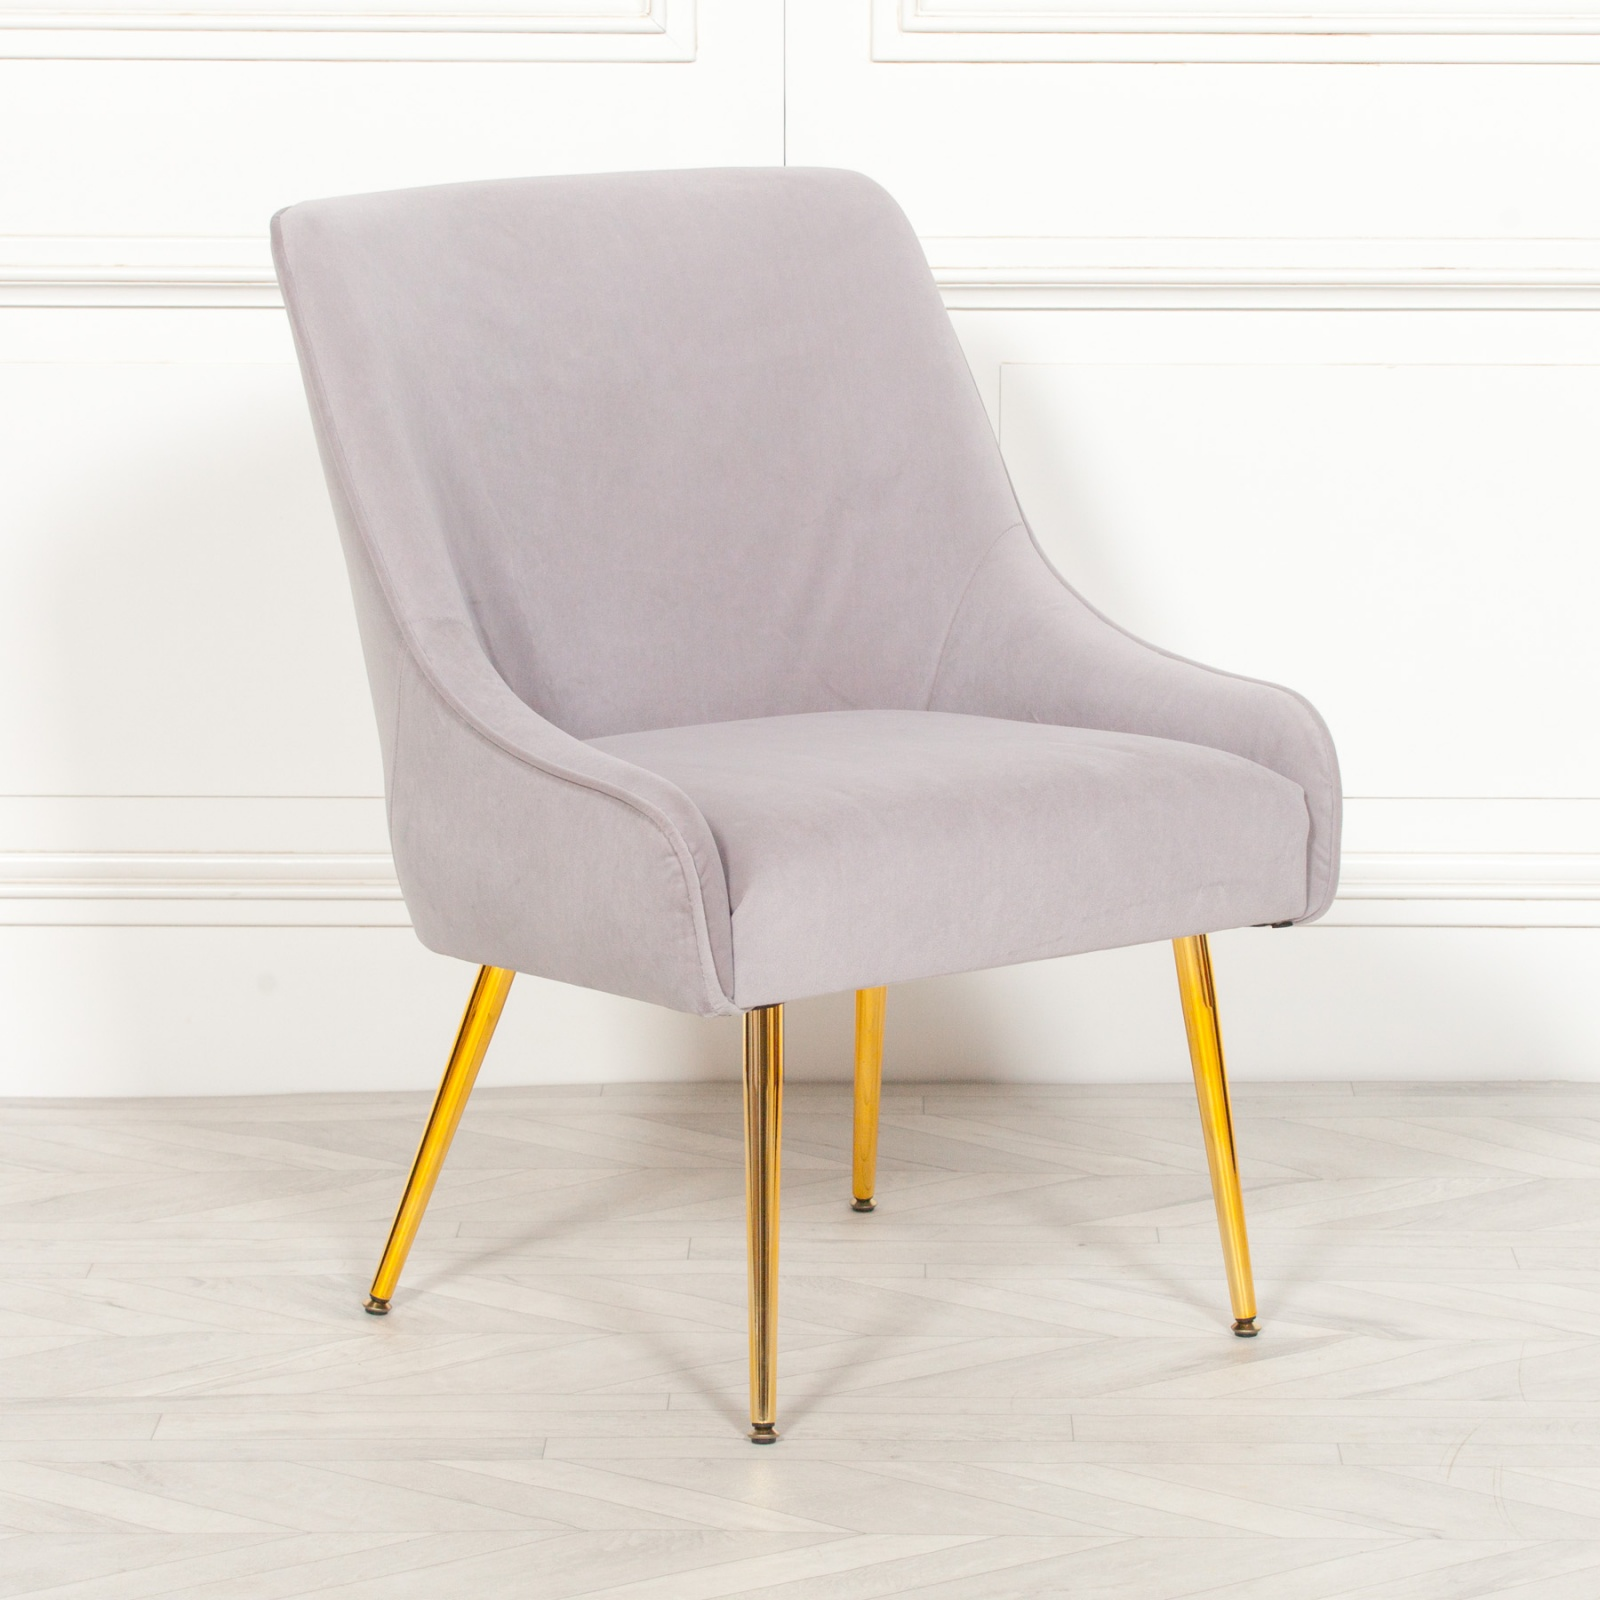 Aurelie Grey Velvet Dining Chair With Gold Legs Furniture La Maison Chic Luxury Interiors